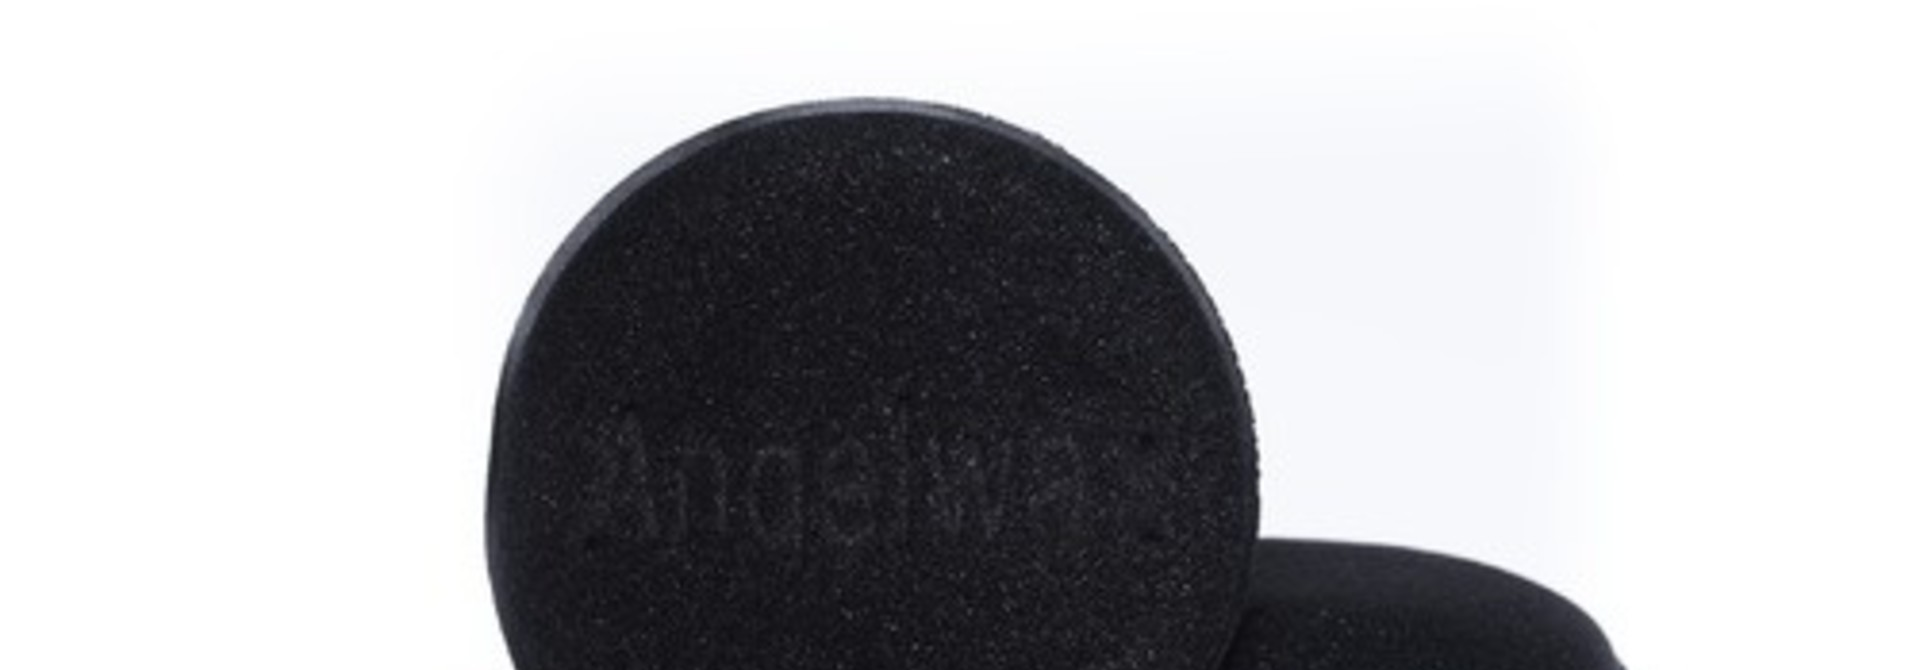 Soft Foam Applicator